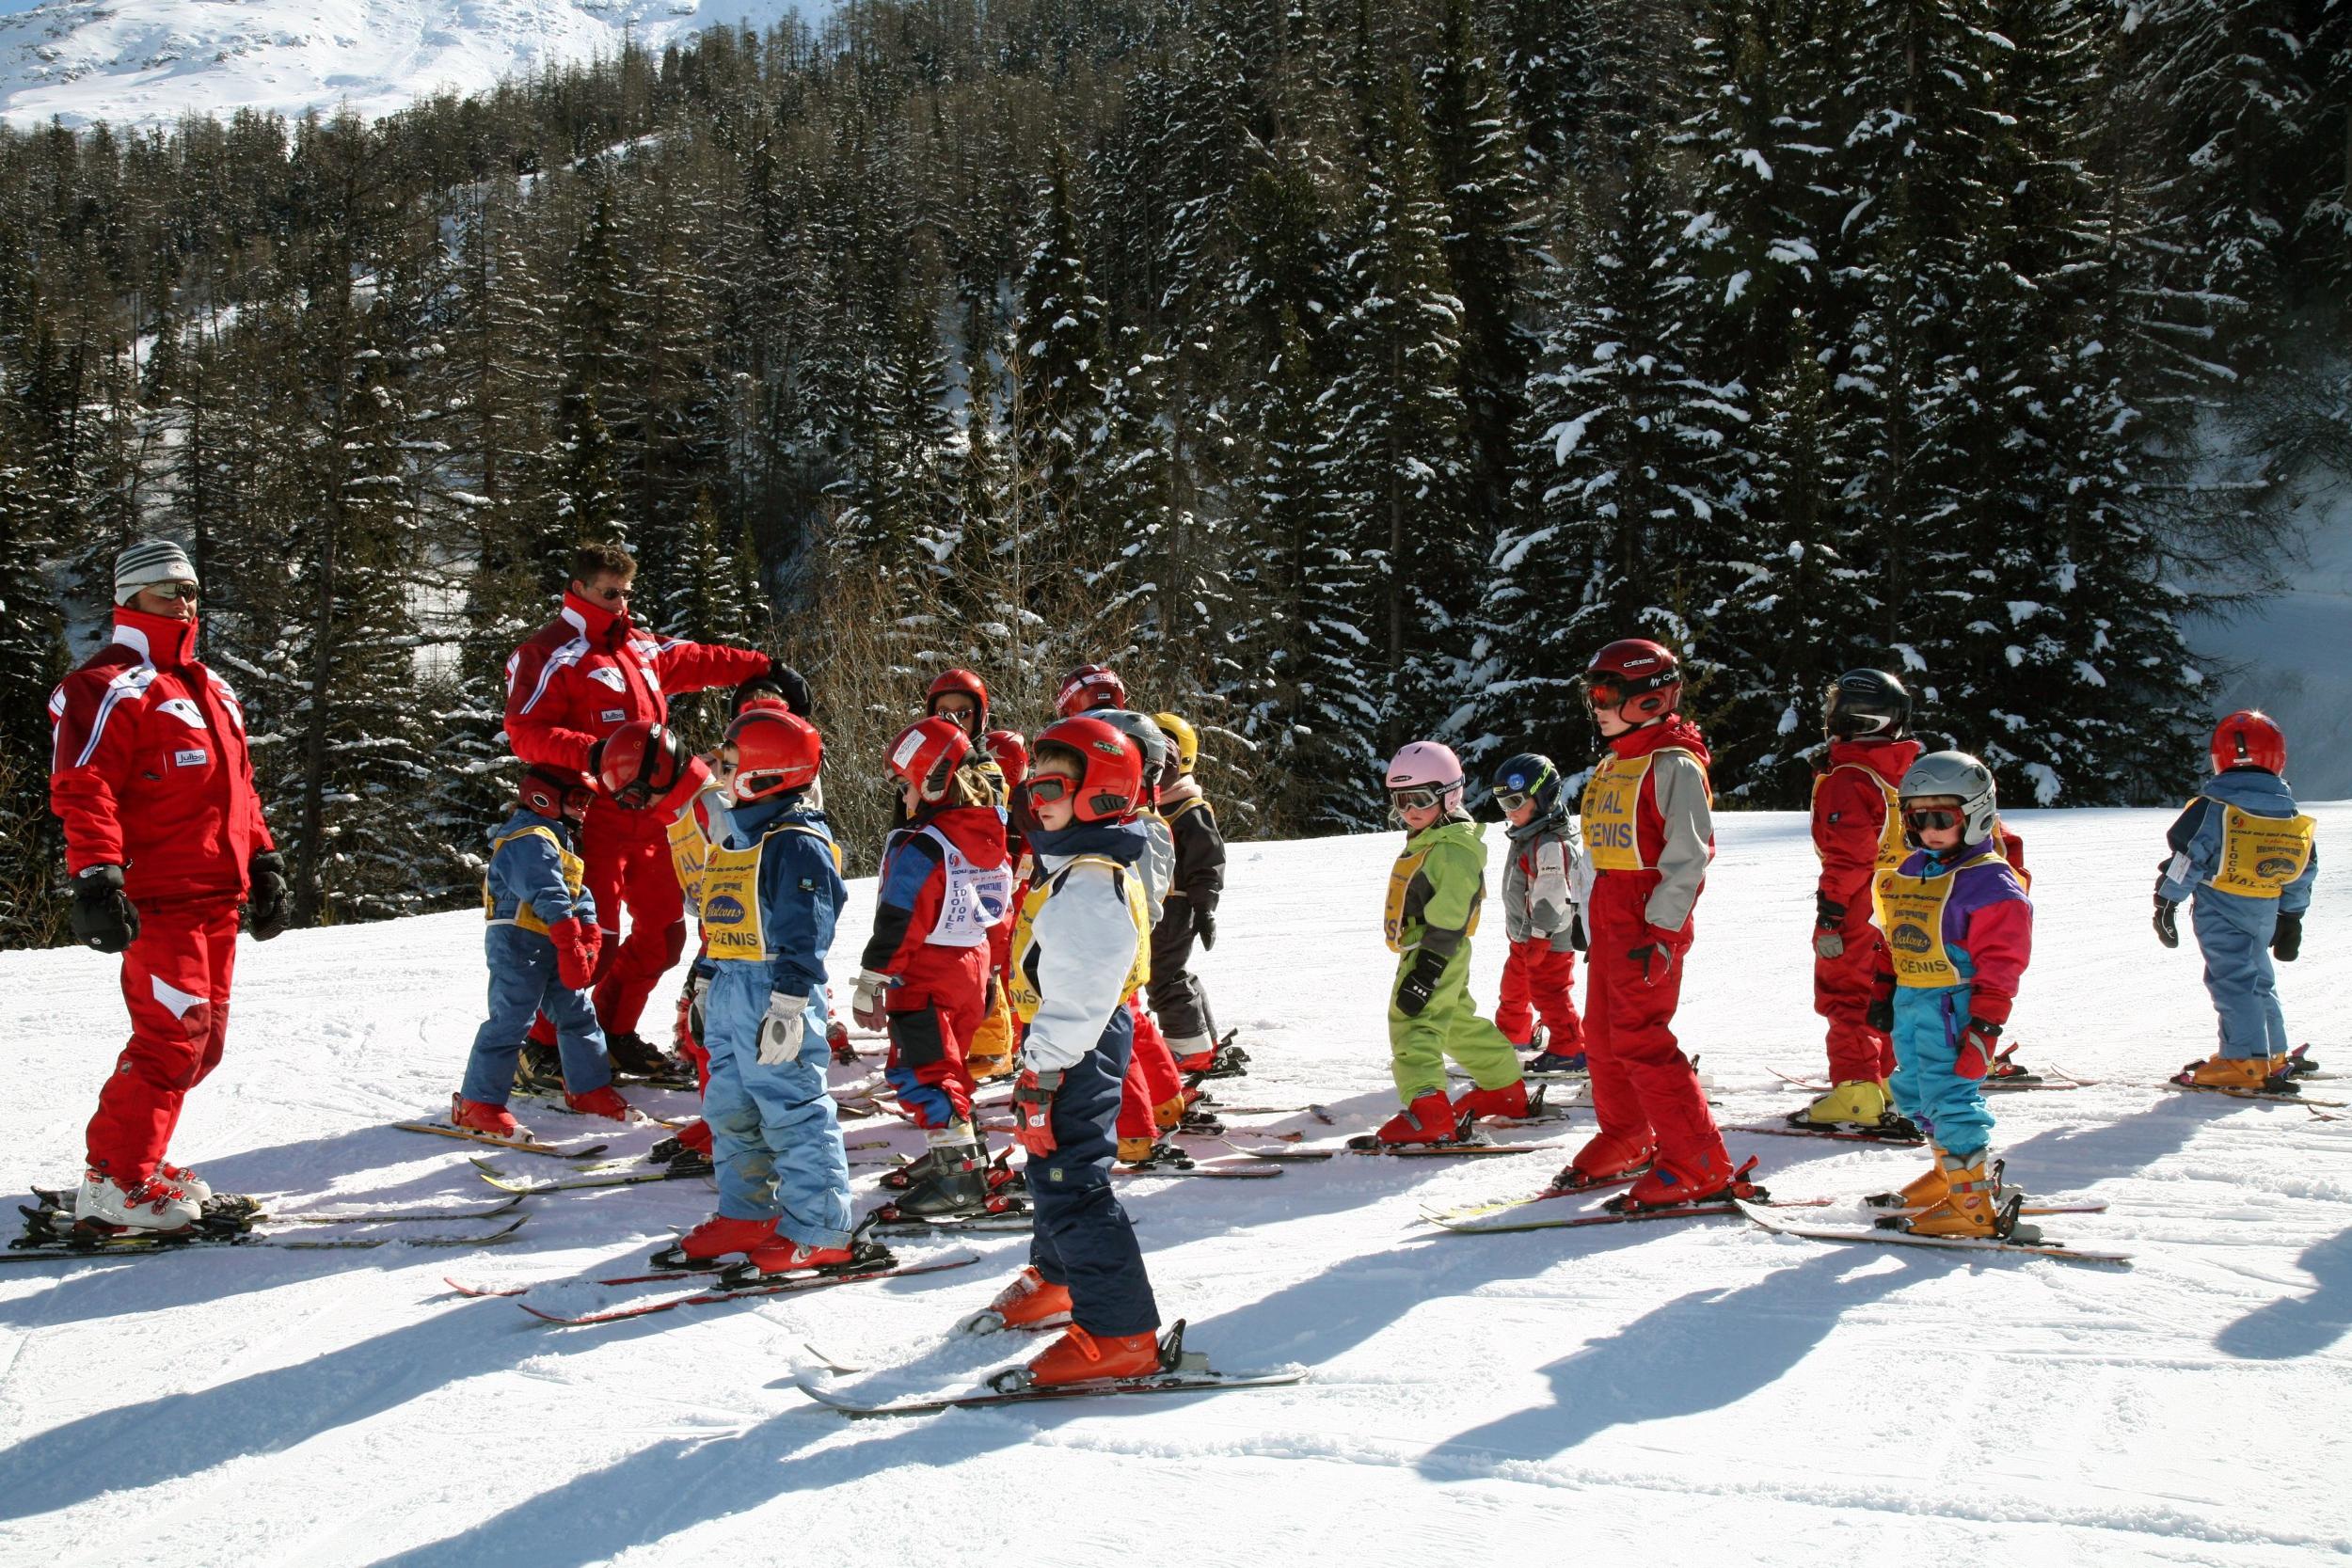 skigebiet maurienne val cenis vanoise skifahren pistenplan apr s ski. Black Bedroom Furniture Sets. Home Design Ideas